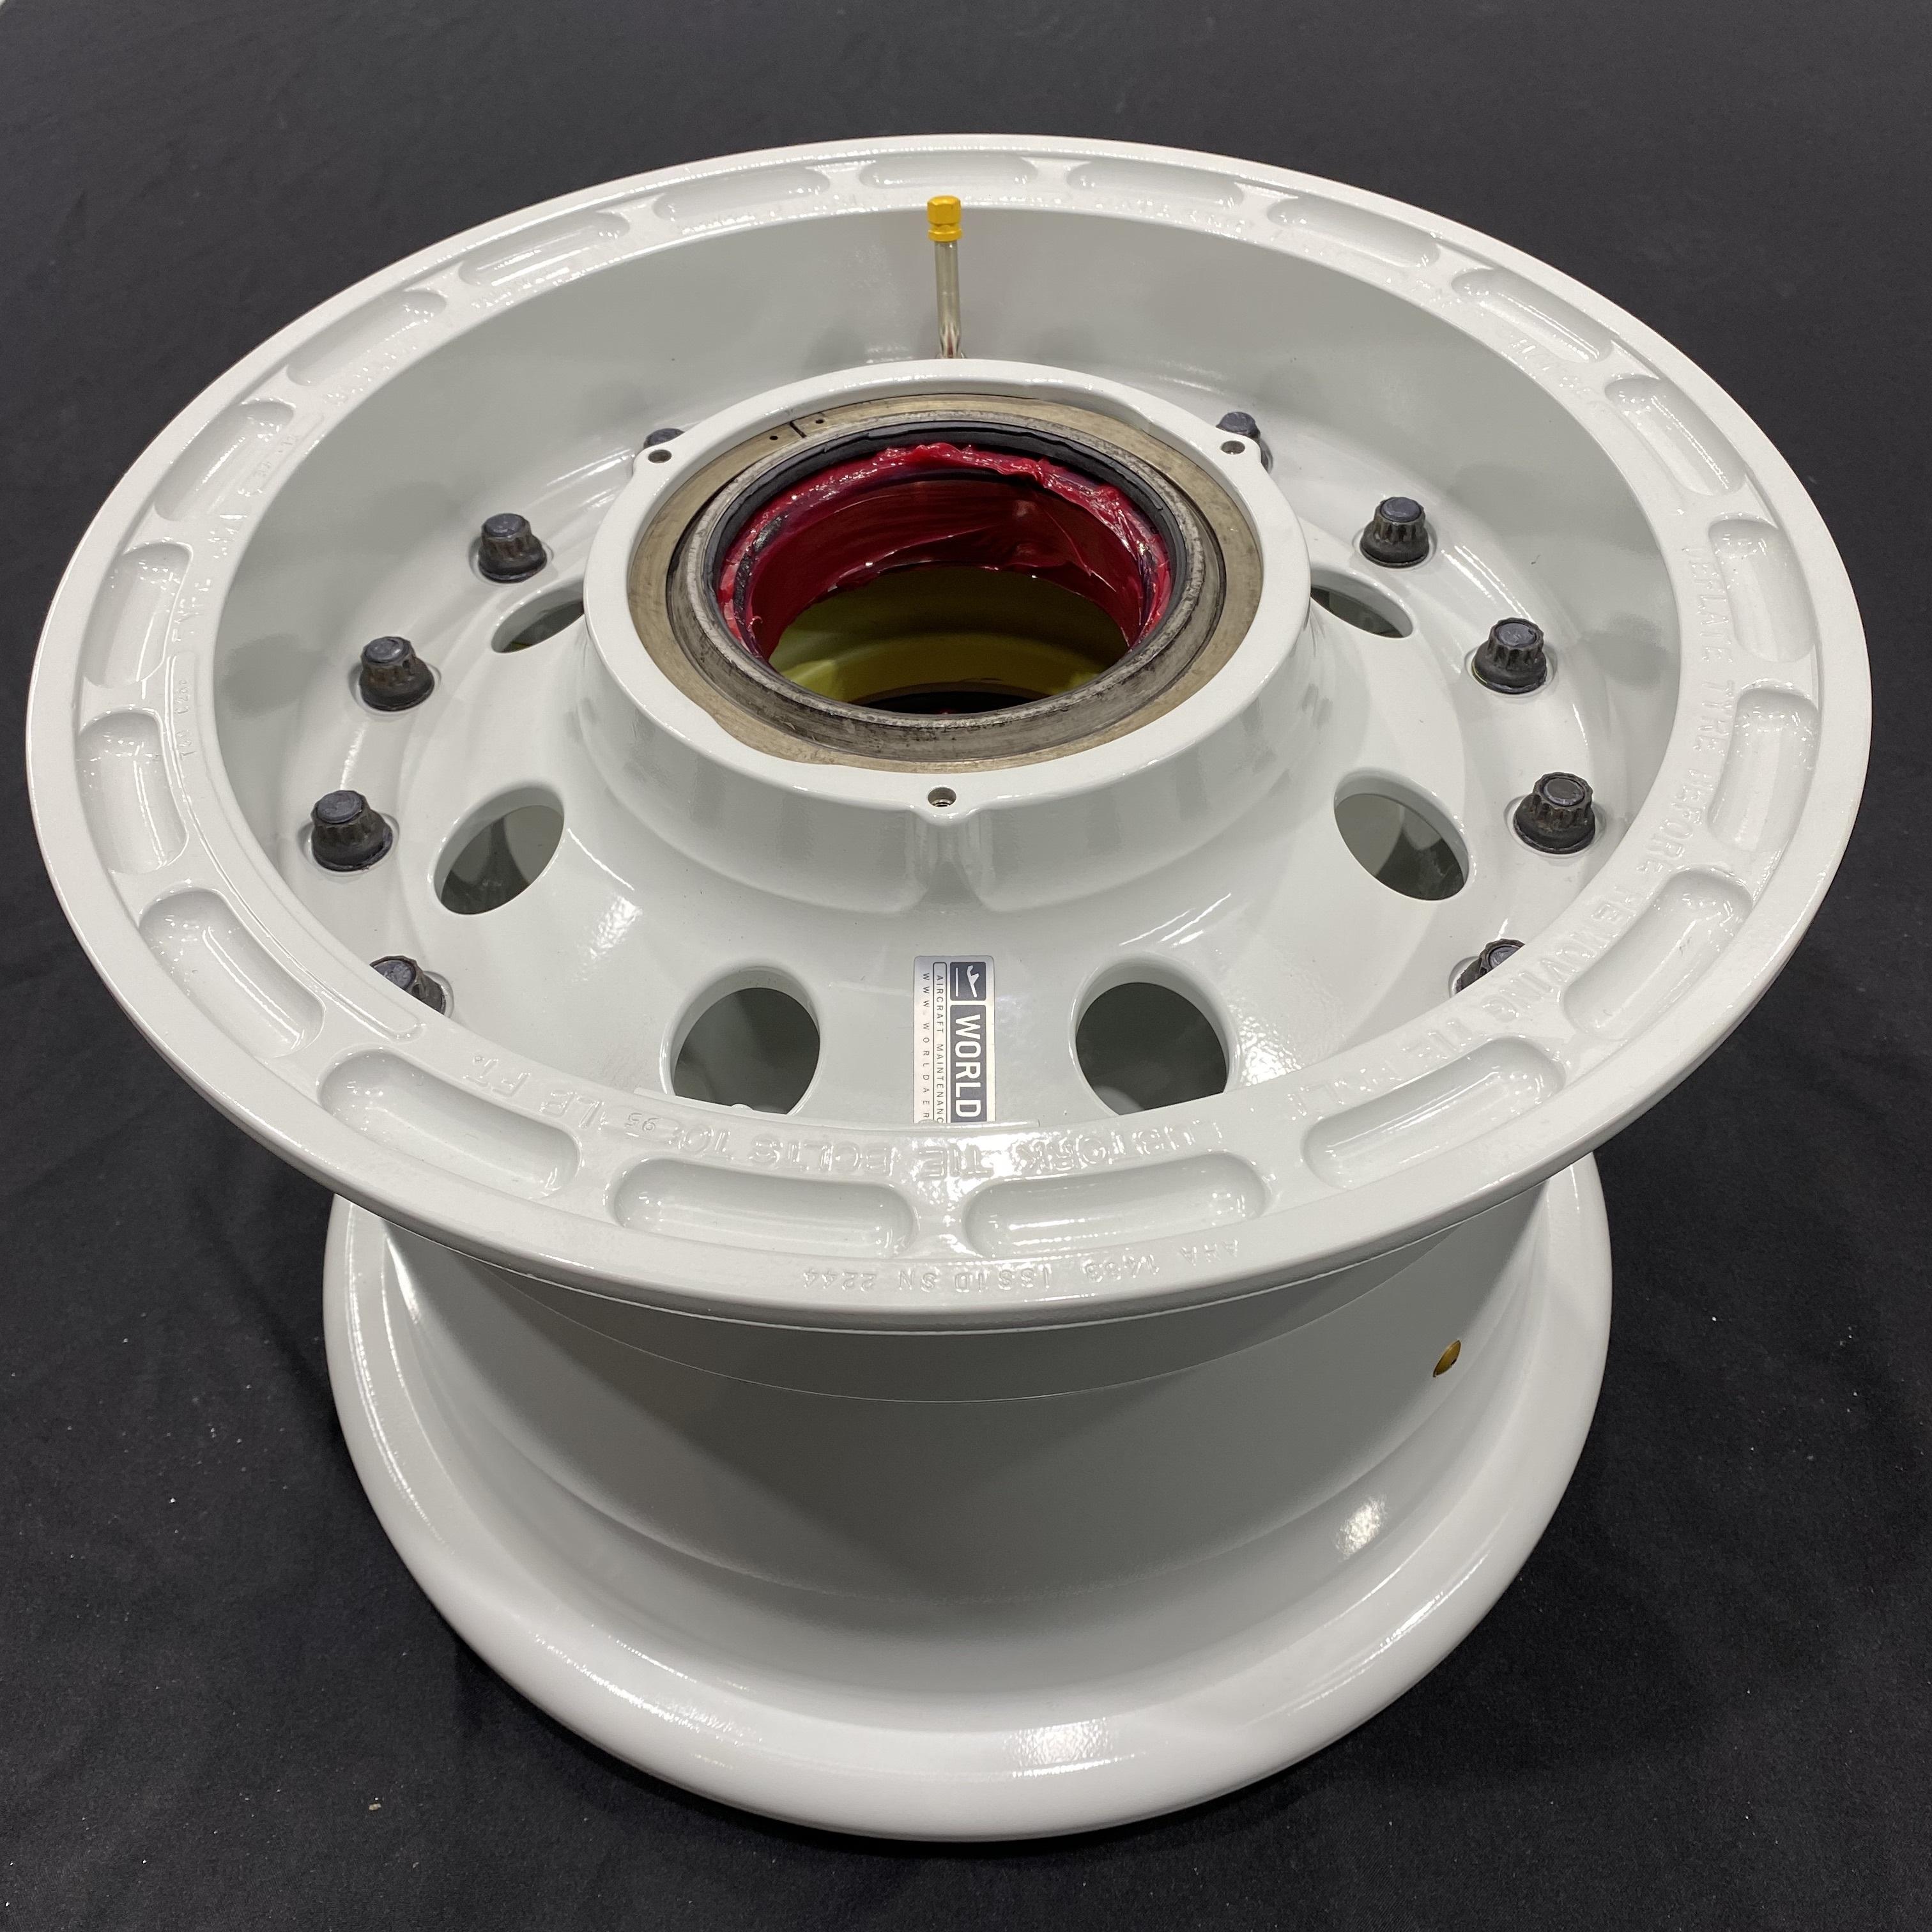 AHA2218 BAe146 Avro RJ main wheel